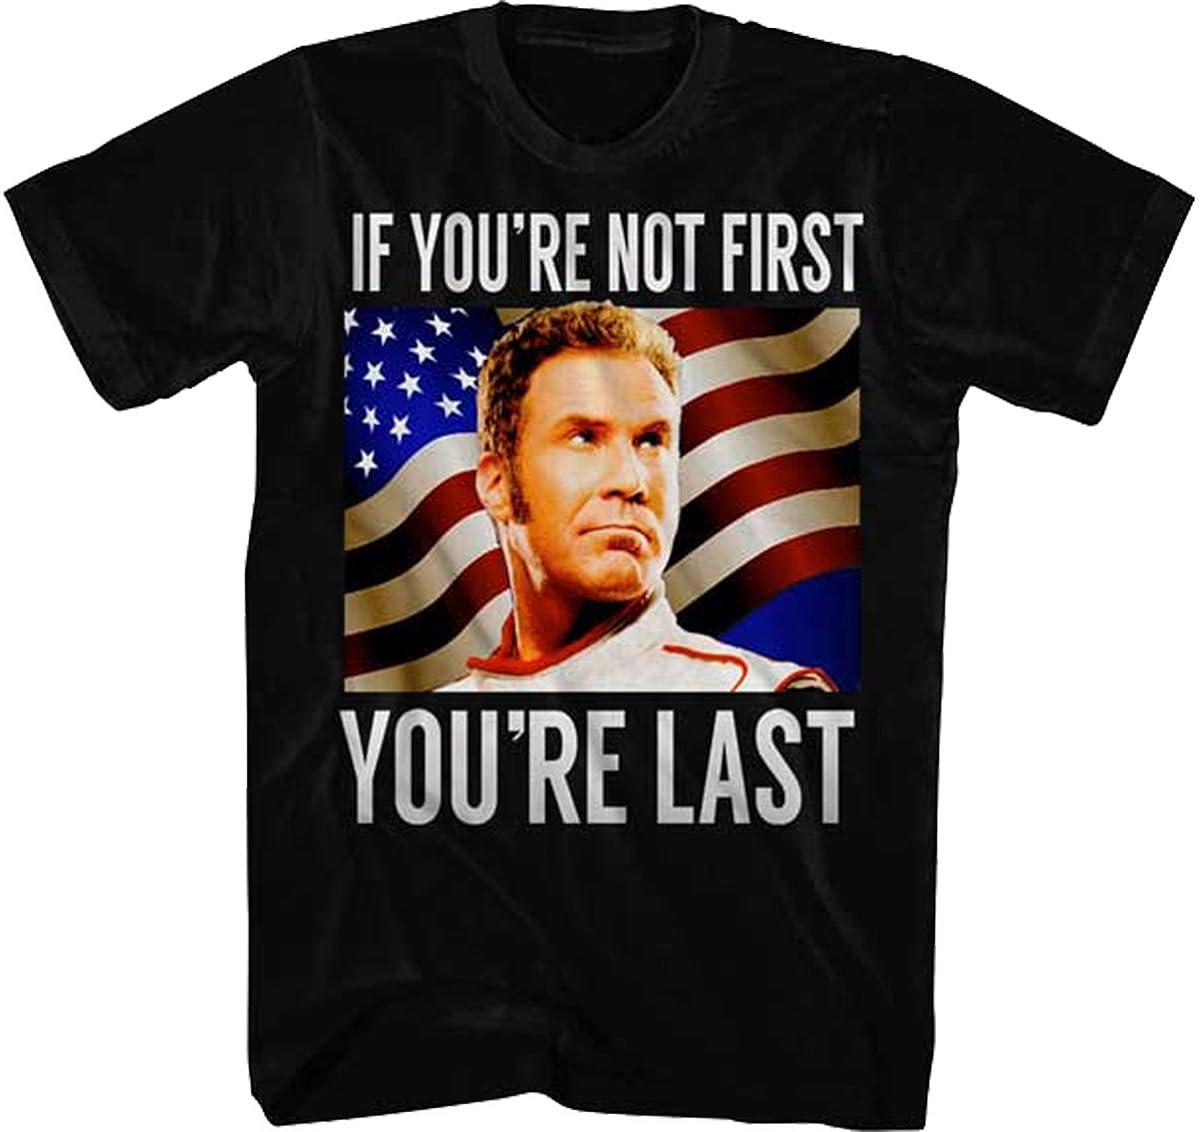 Talladega Nights Men's Talladega Nights You're Last Graphic T-Shirt, Black, X-Large